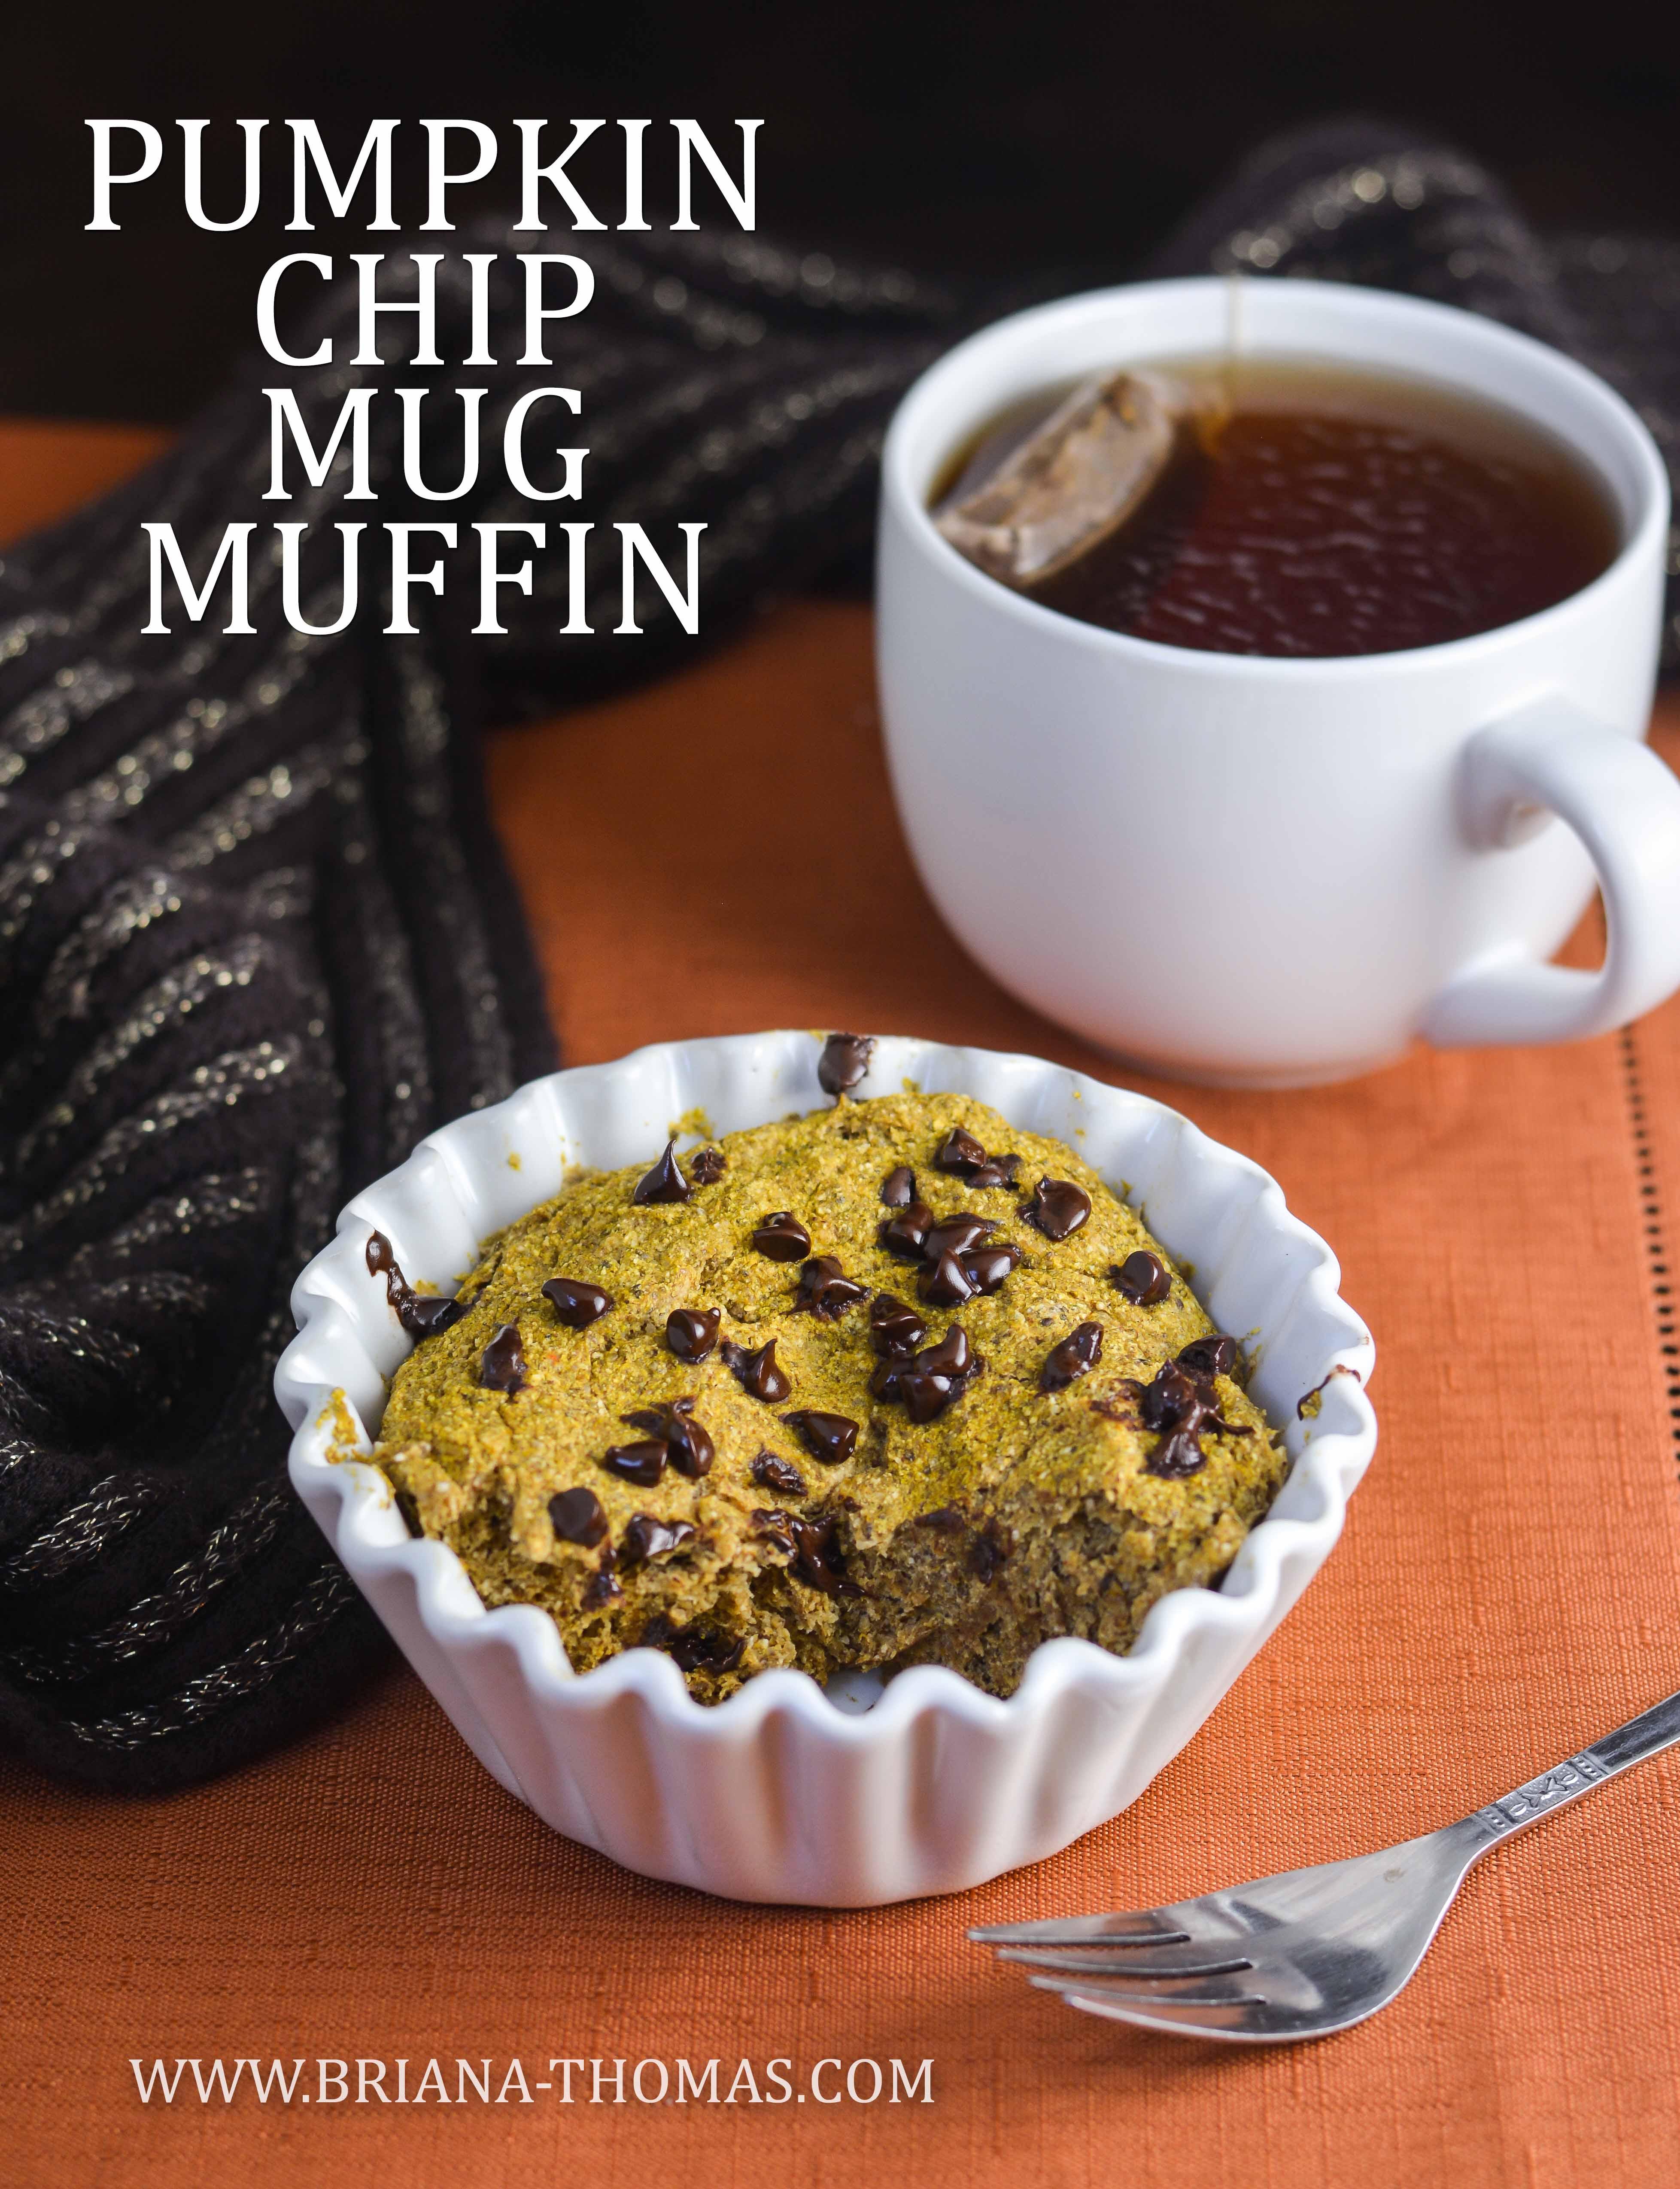 Thm Mug Recipes